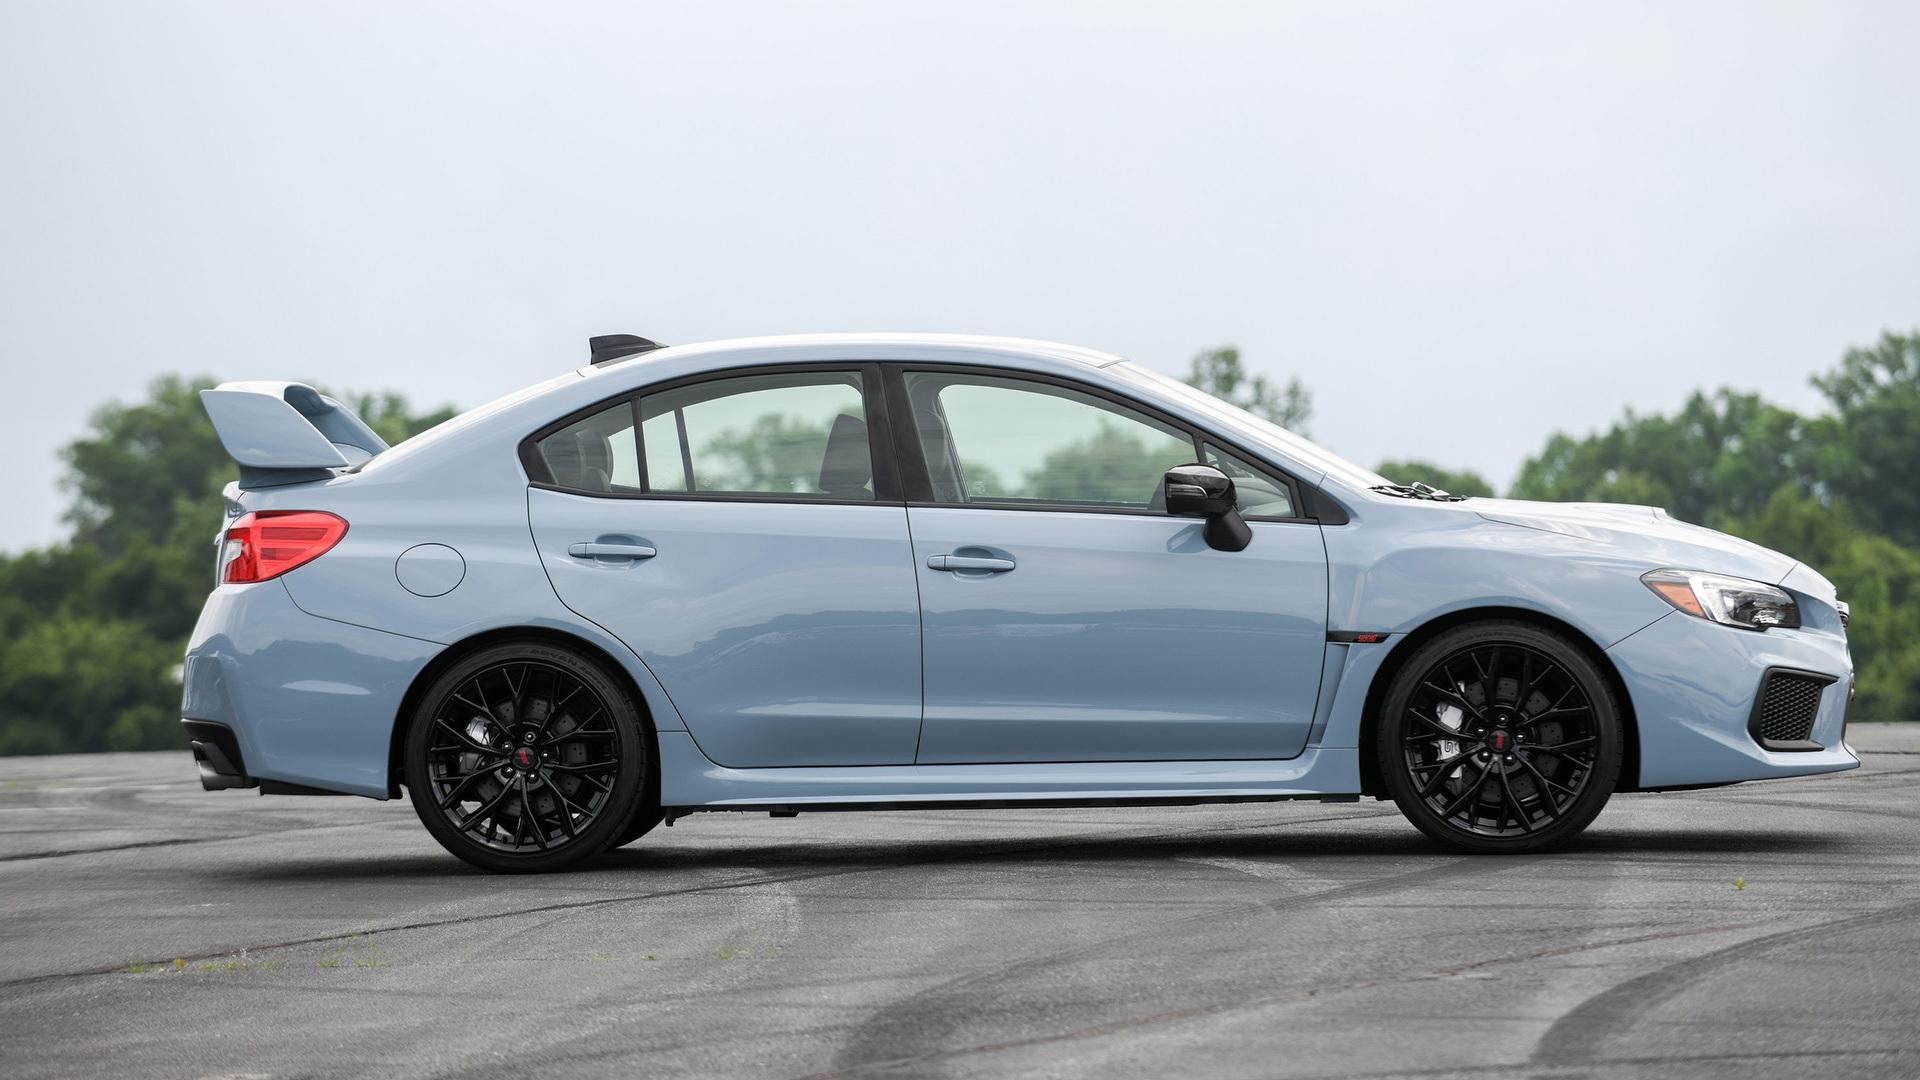 Build Your Own Subaru >> Subaru Drops Photos Of 2019 Wrx Wrx Sti Series Gray